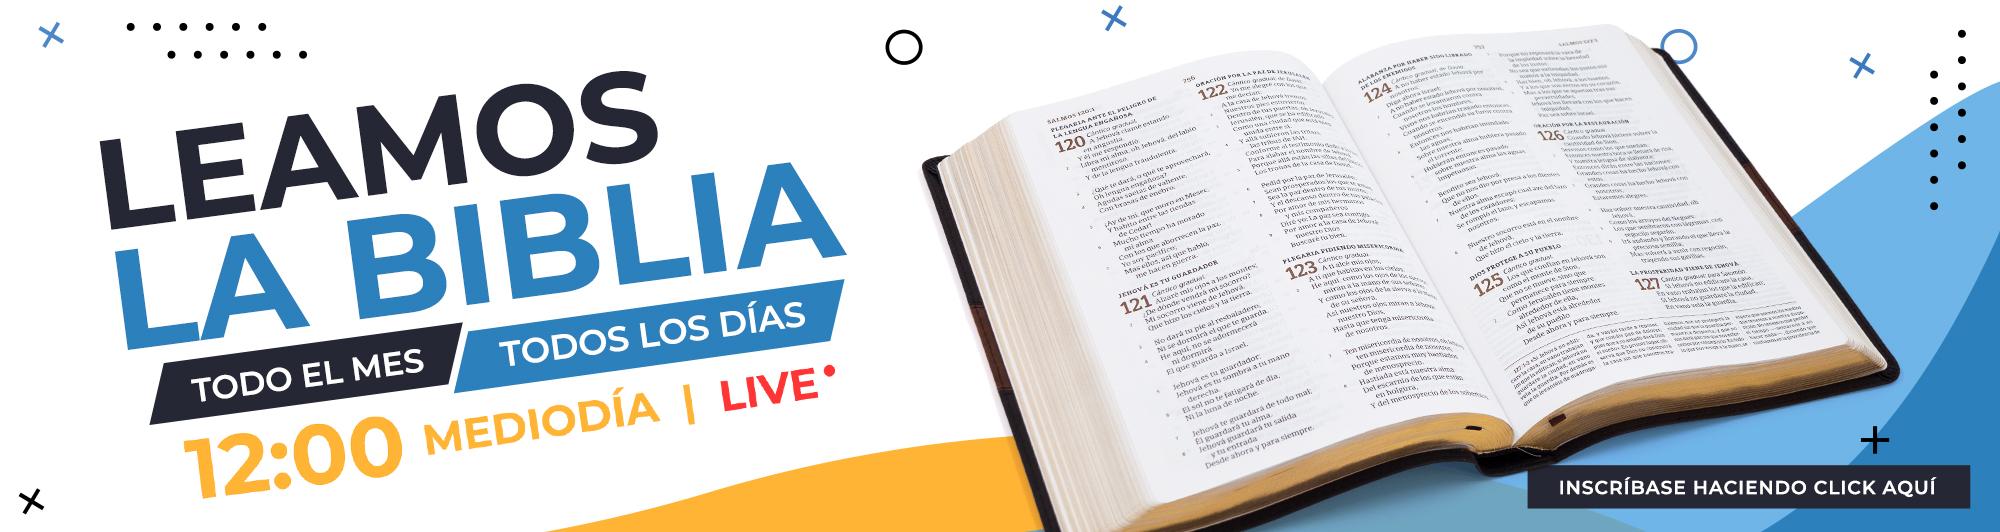 1.2. Leamos-la-Biblia---Banner-Web